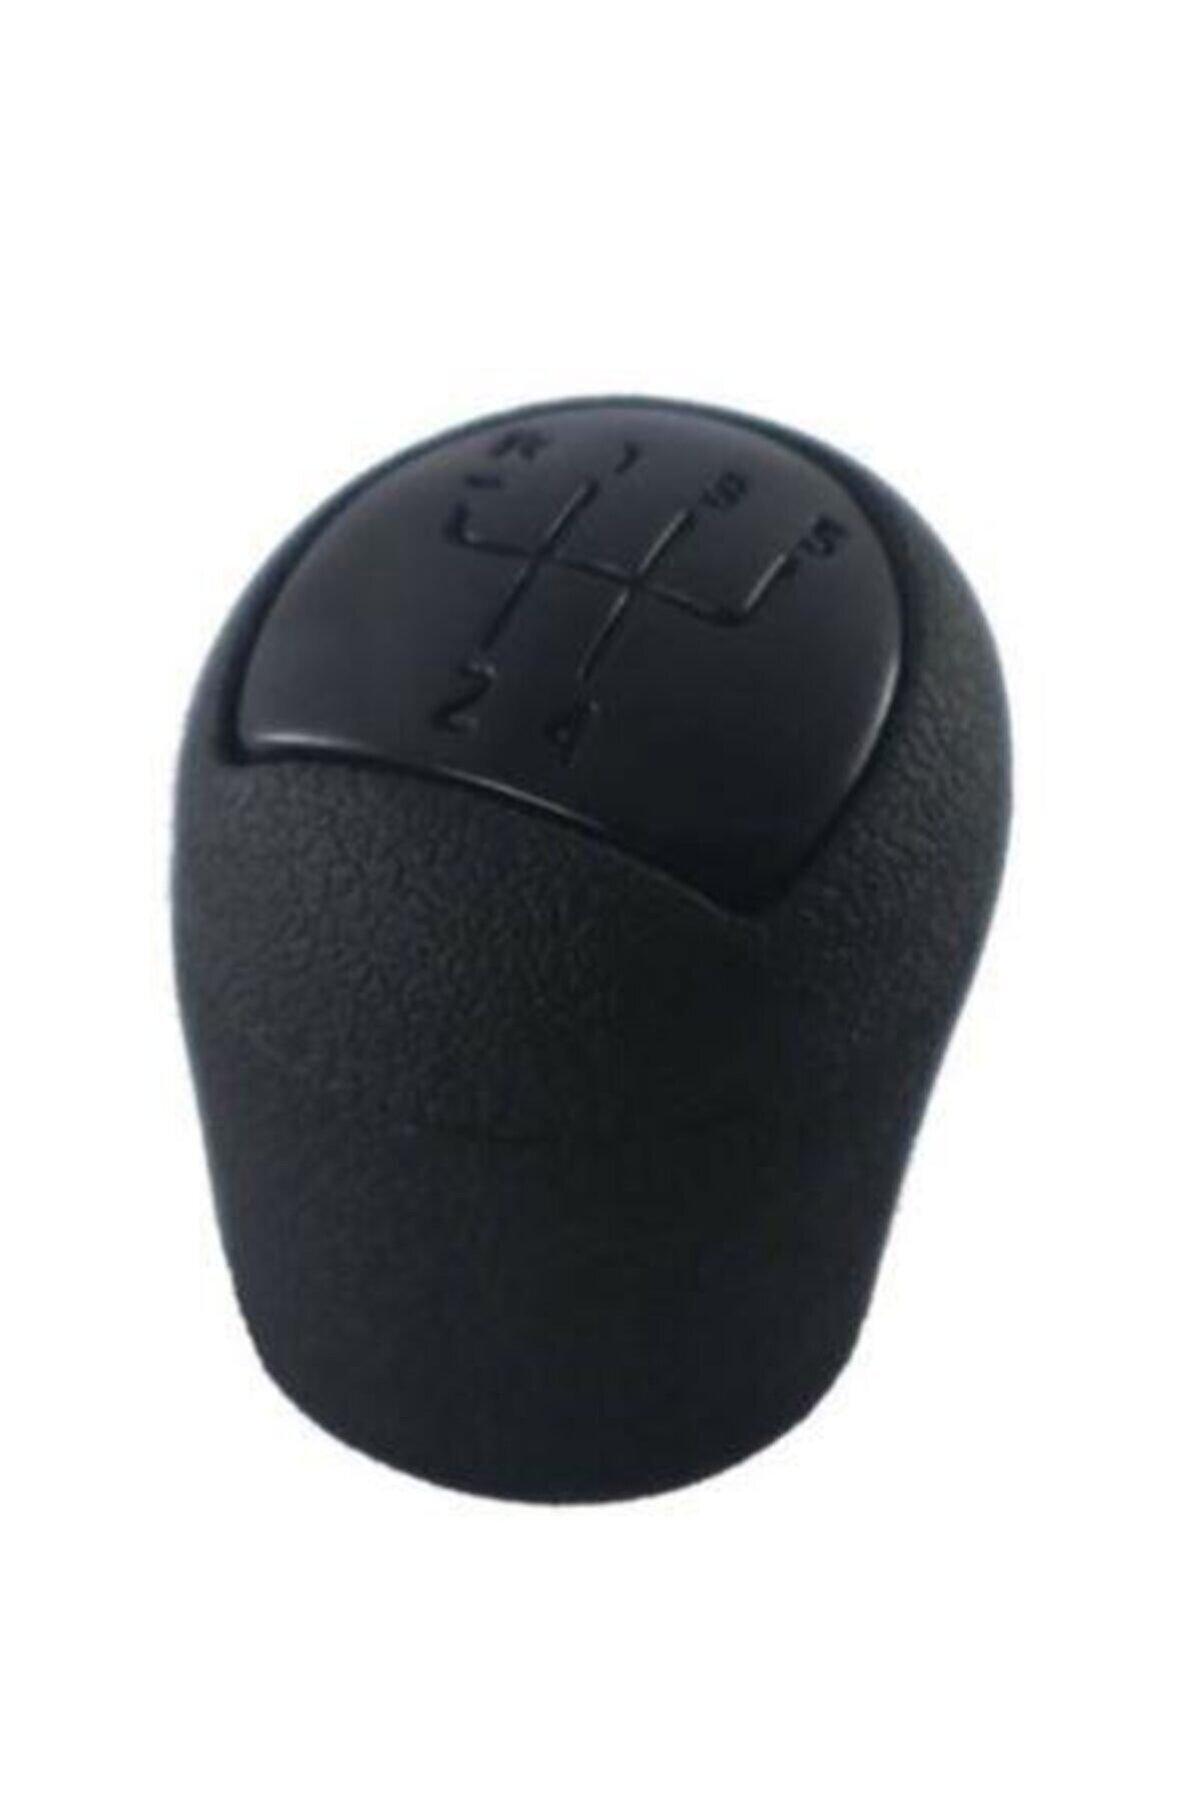 Vts Körük Renault Kangoo Vites Topuzu Siyah Kapak